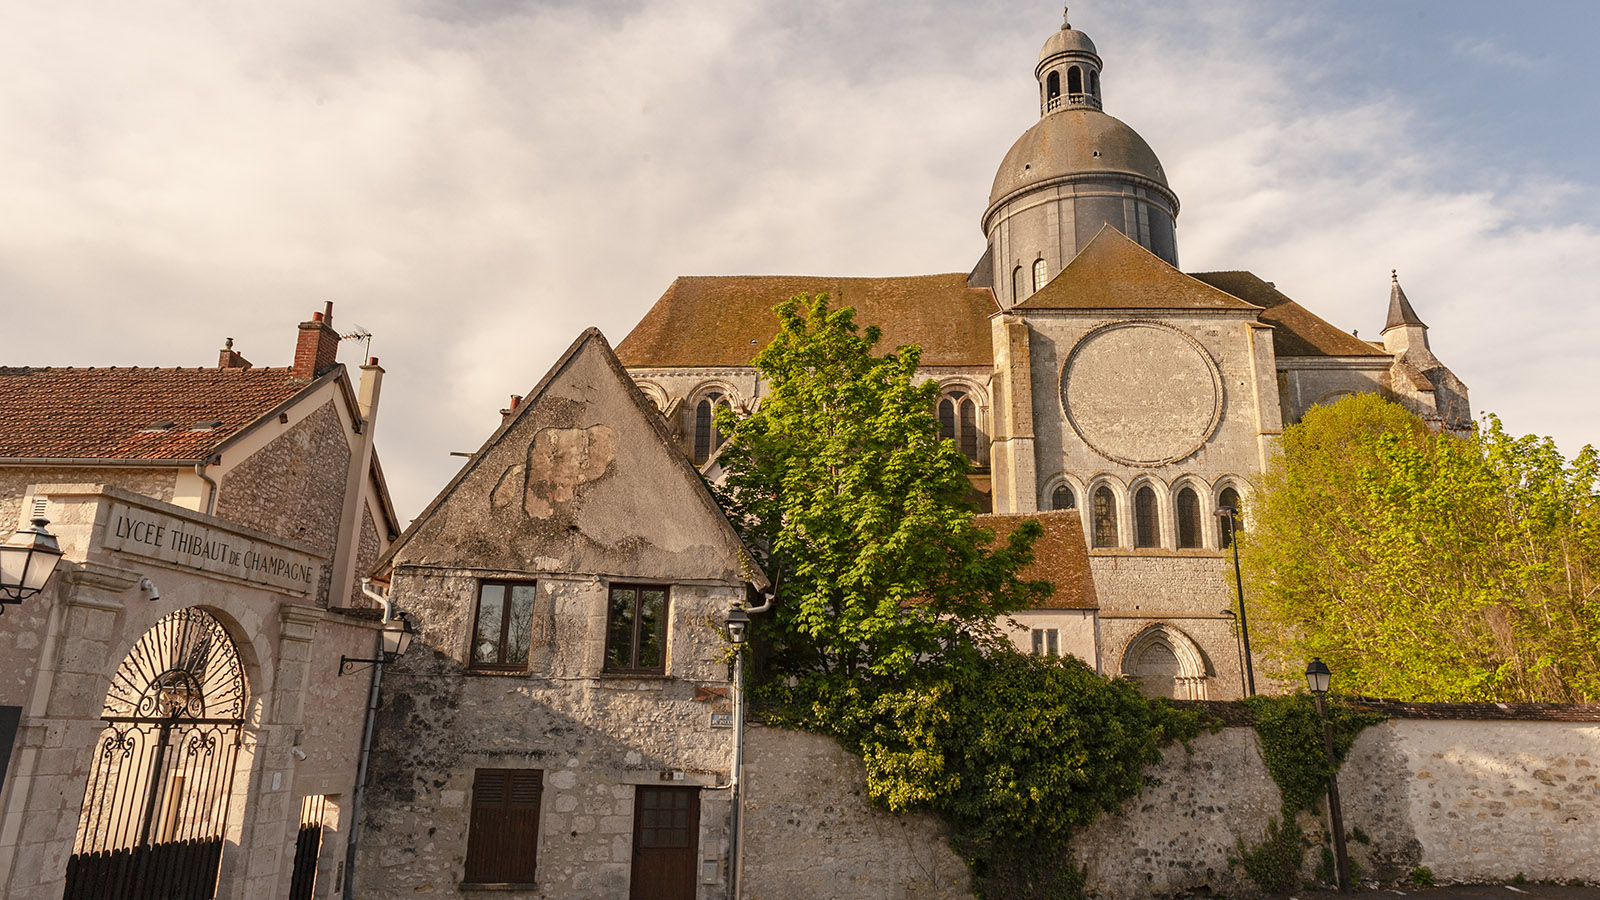 Eindrucksvoll: das Collégiale St-Quiriace in Provins. Foto: Hilke Maunder